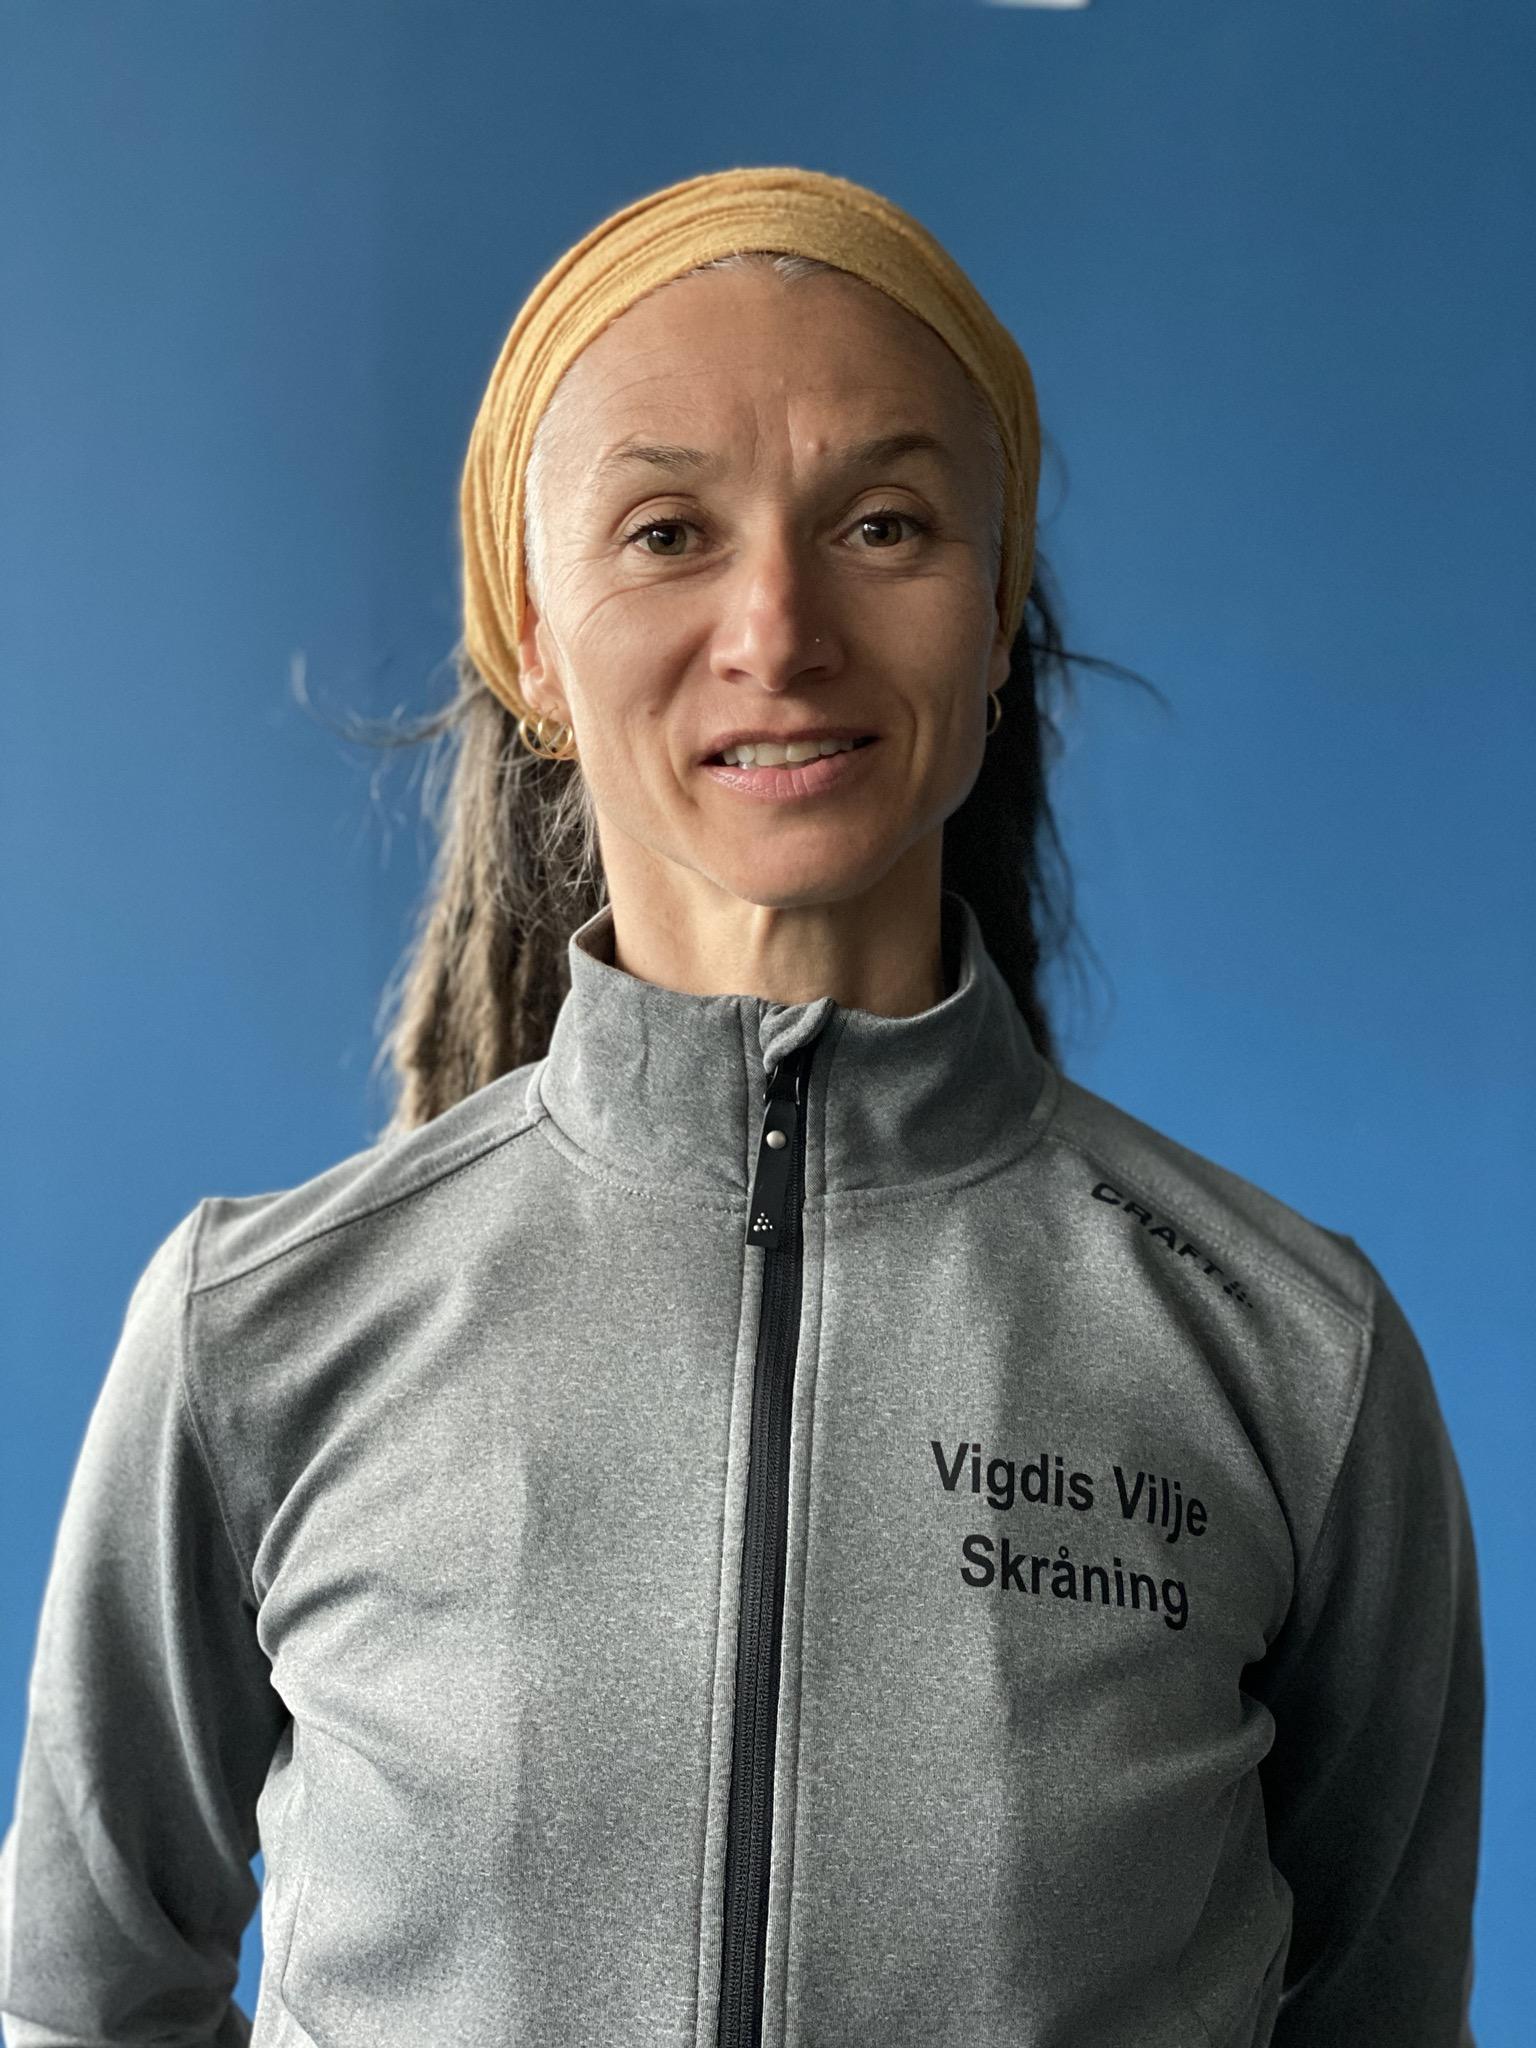 VIGDIS V. SKRÅNING